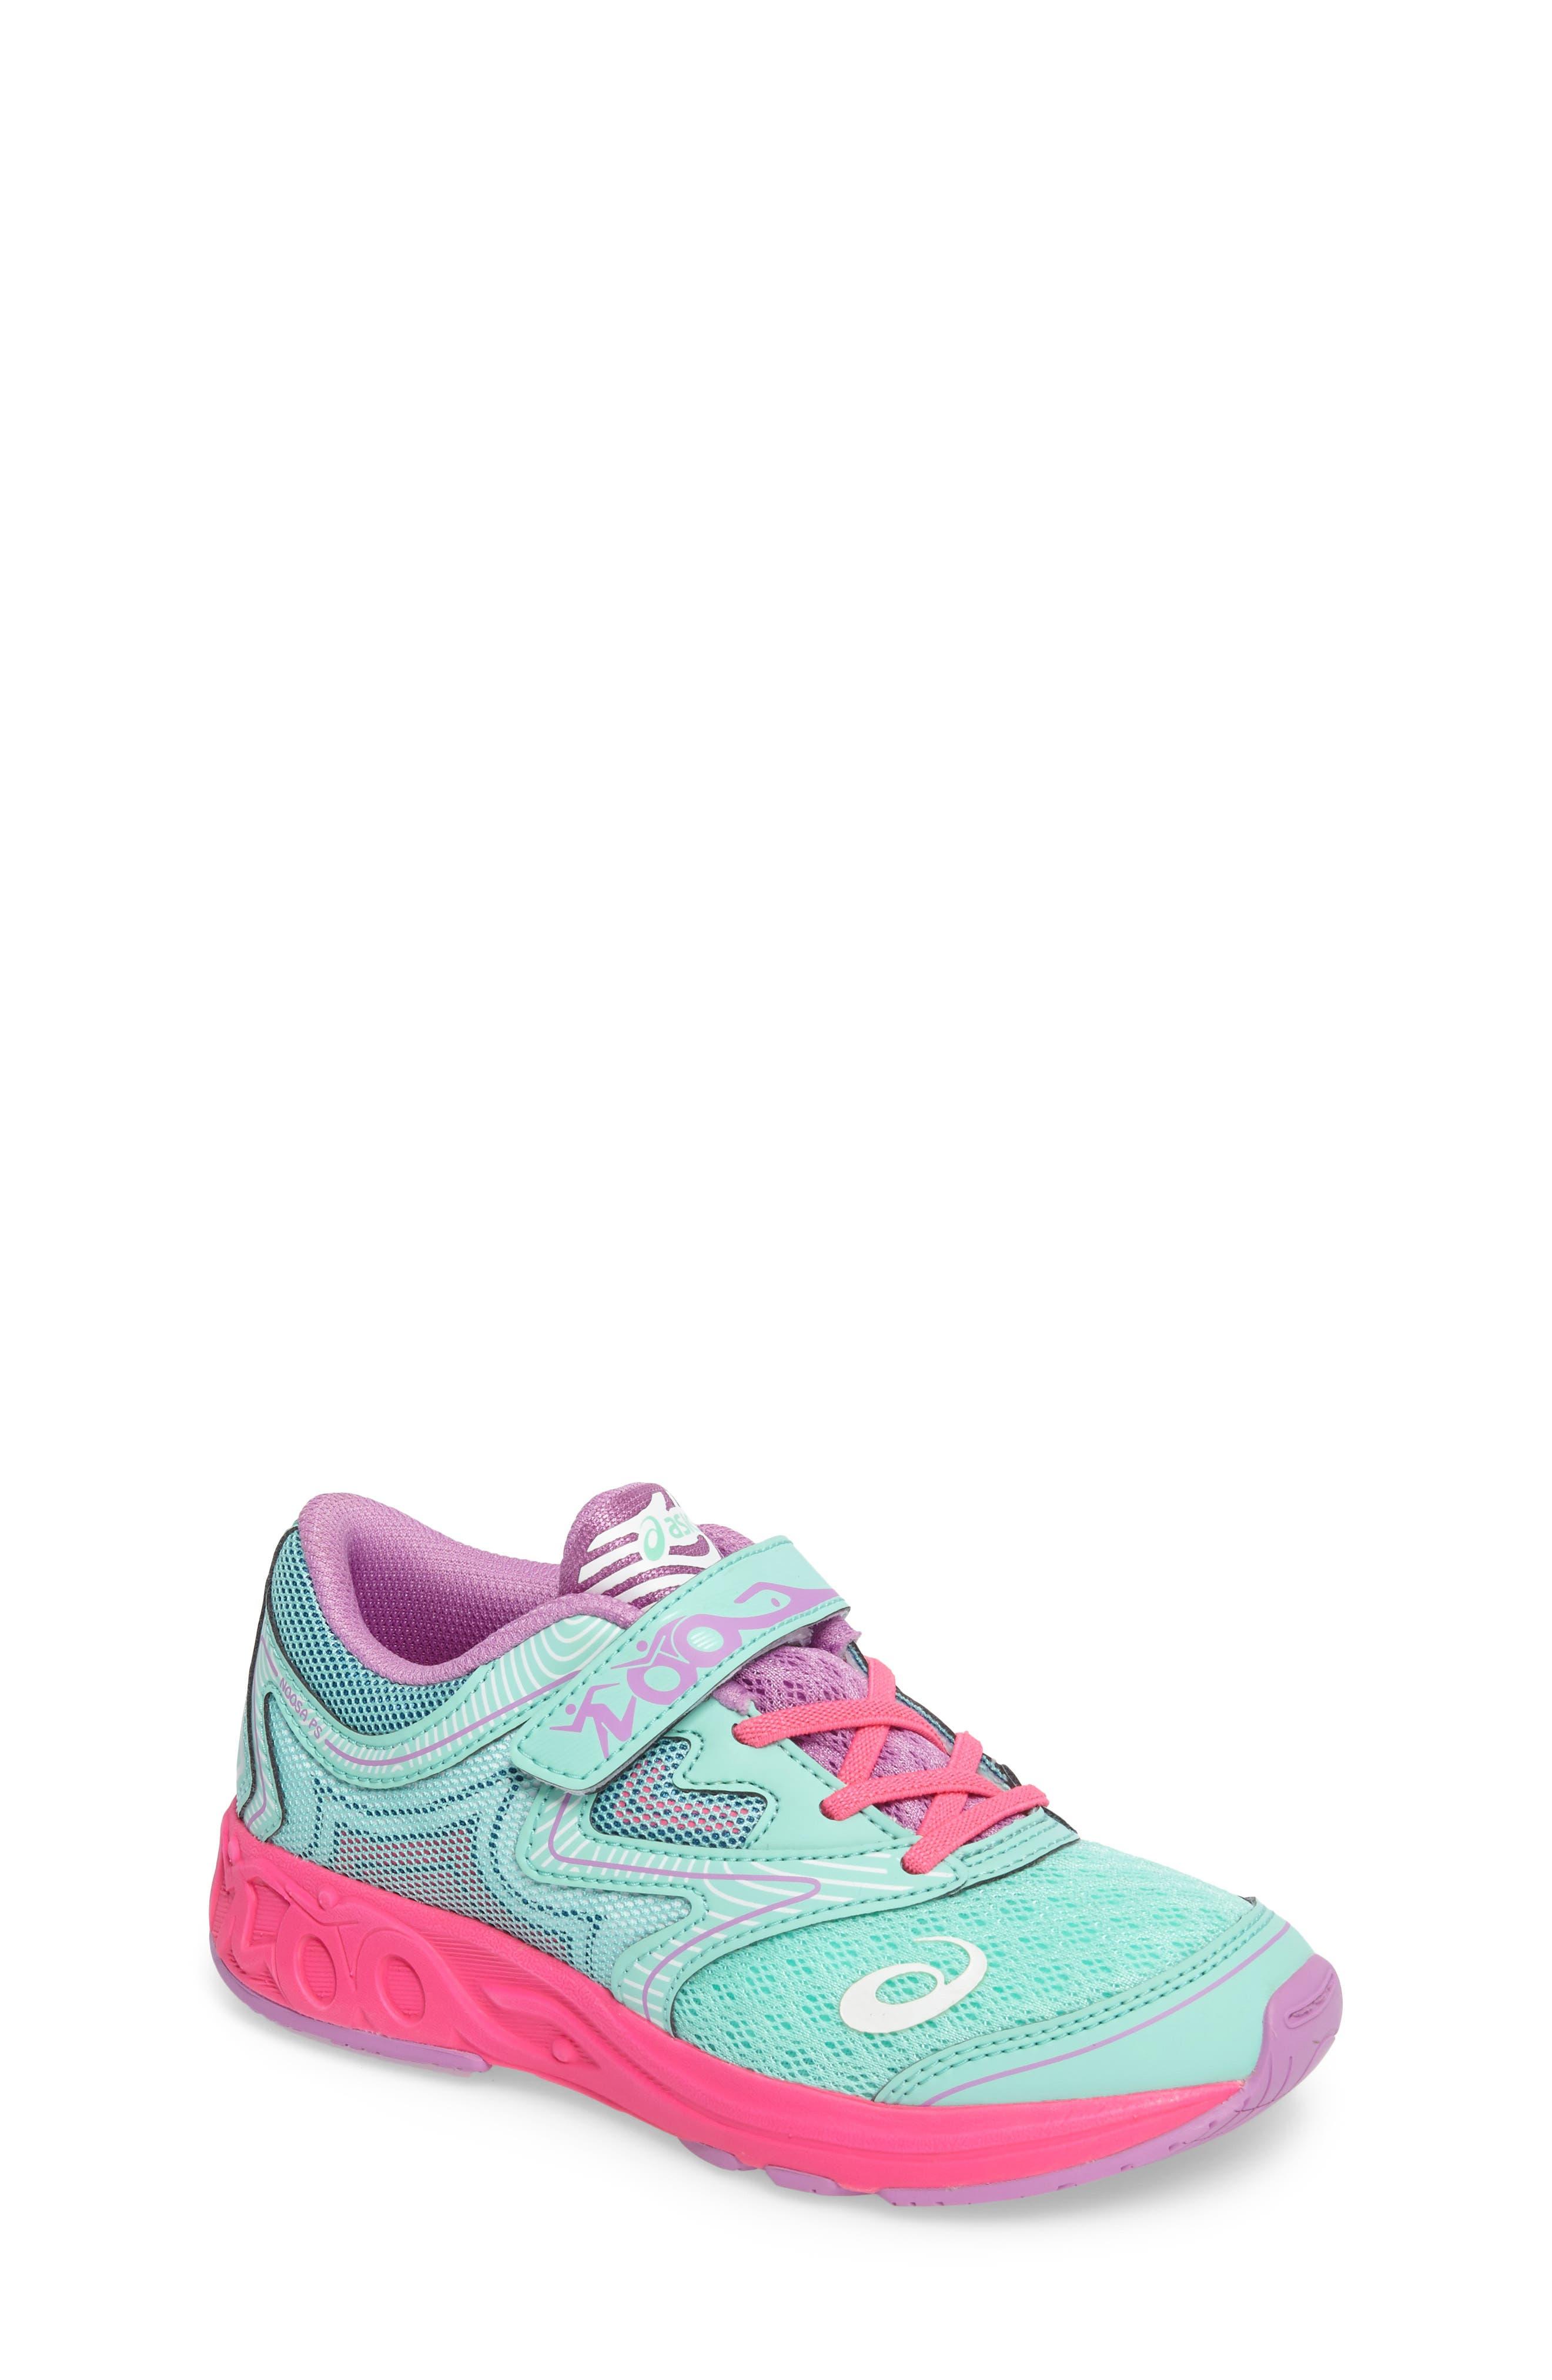 Noosa PS Sneaker,                             Main thumbnail 1, color,                             330